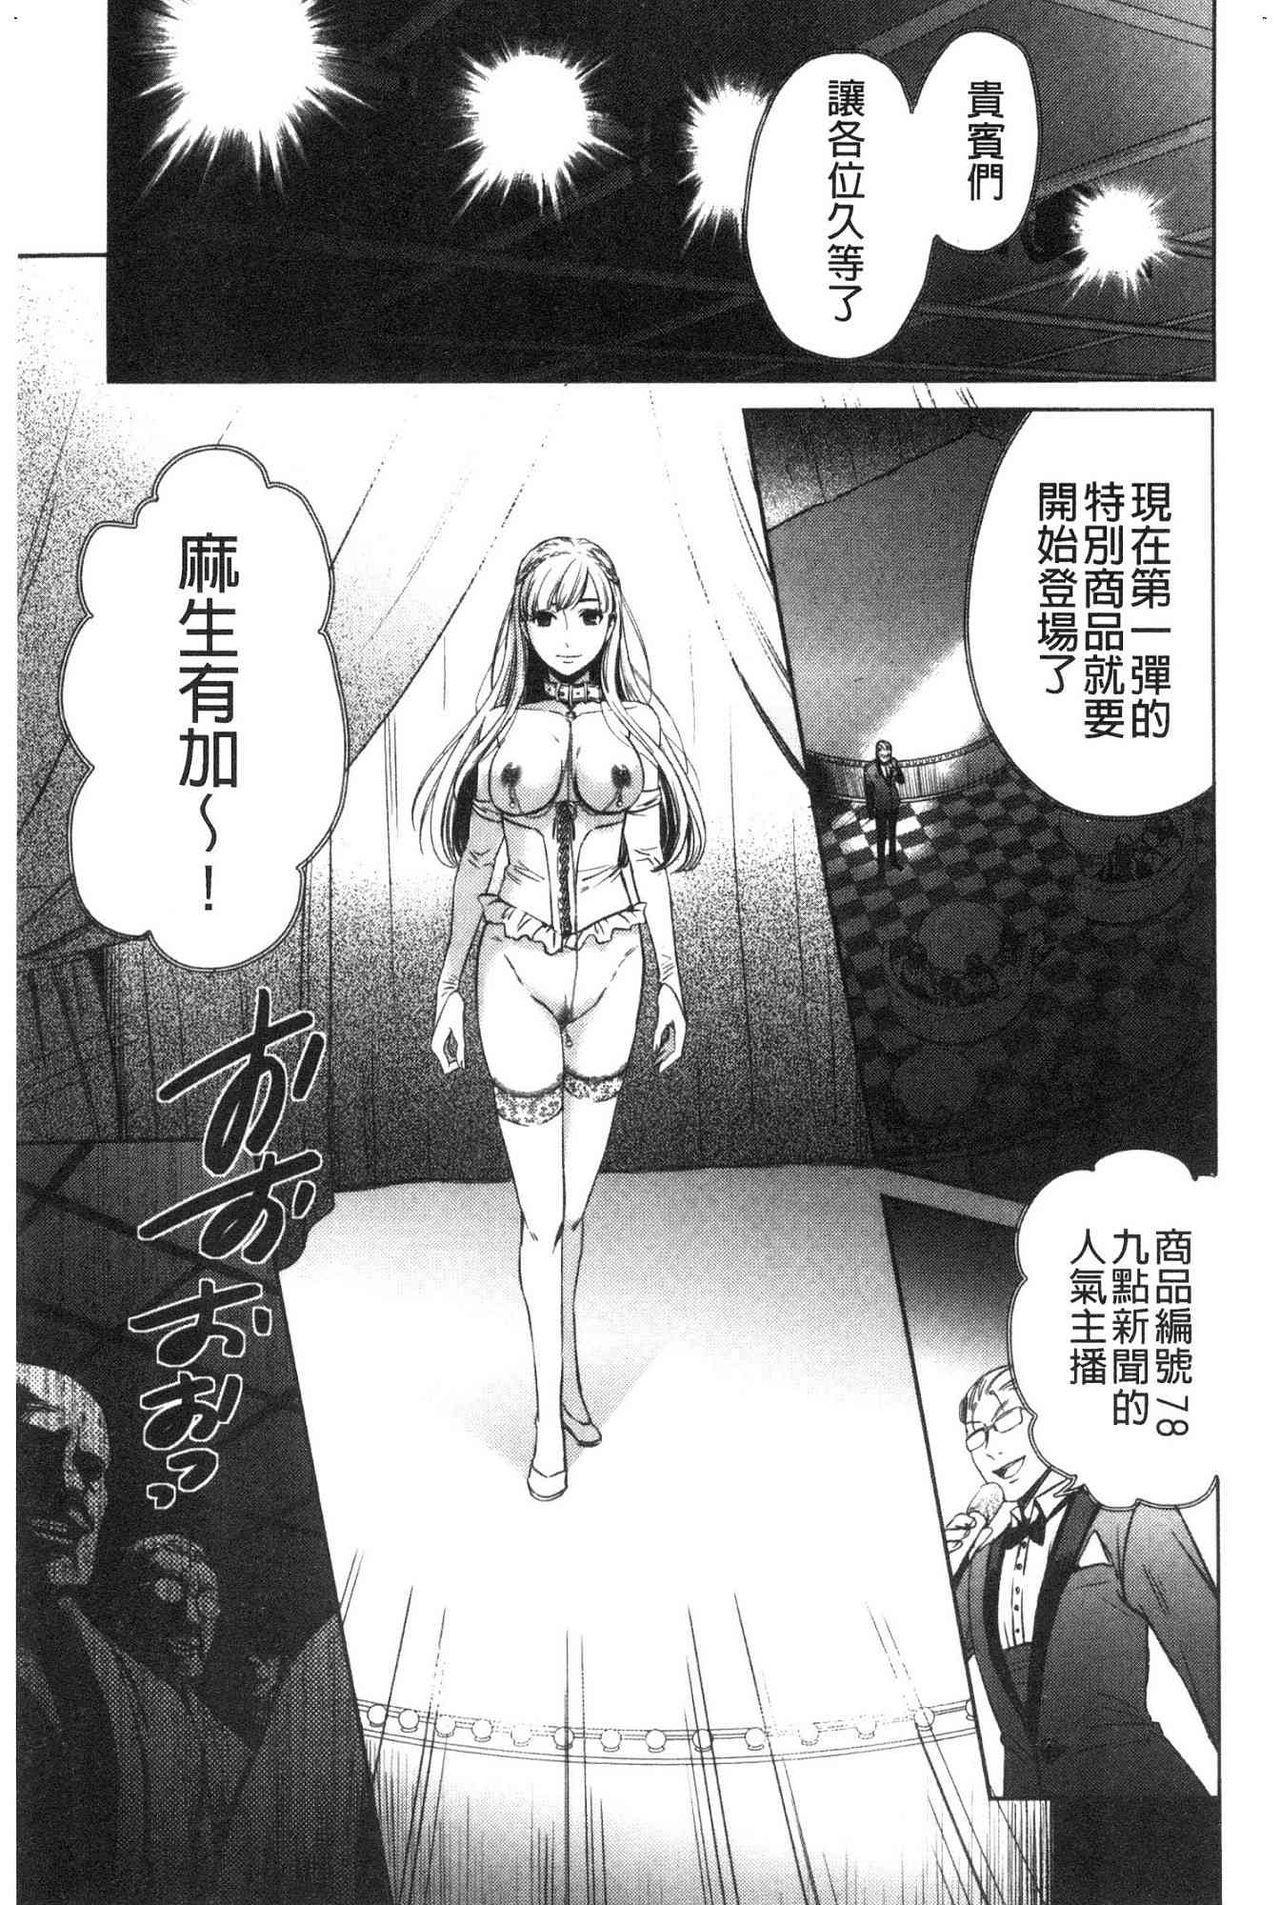 [Gotoh Akira]  21-ji no Onna ~Camera no Mae no Mesuinu~ 2 | 21時之女 ~鏡頭前的牝犬~ 2 [Chinese] 168